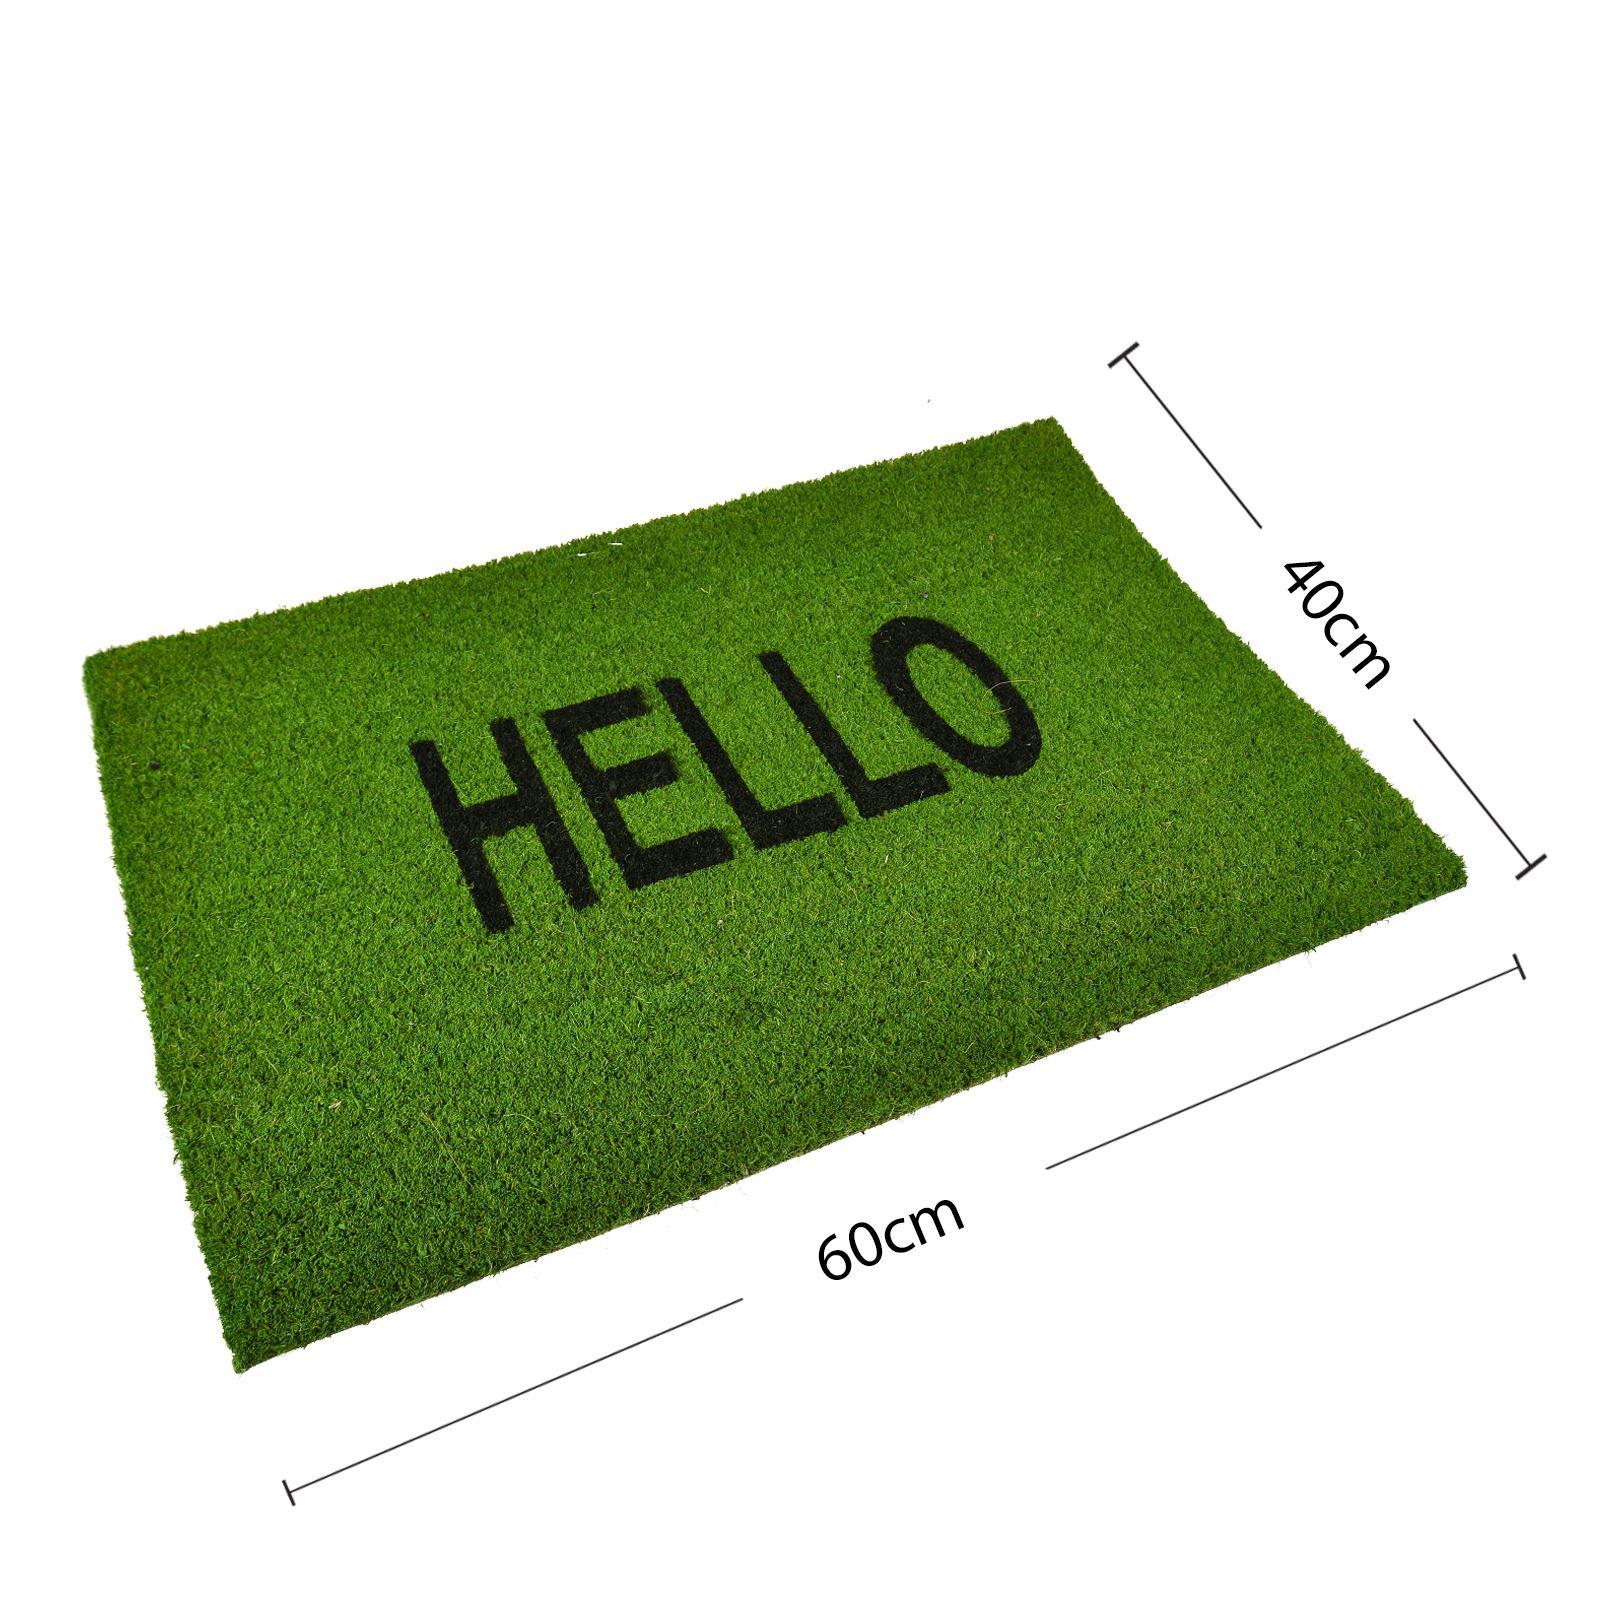 Plain-Non-Slip-Door-Mat-Tough-Natural-Coir-PVC-Back-Welcome-Doormat-40-x-60cm miniatura 65